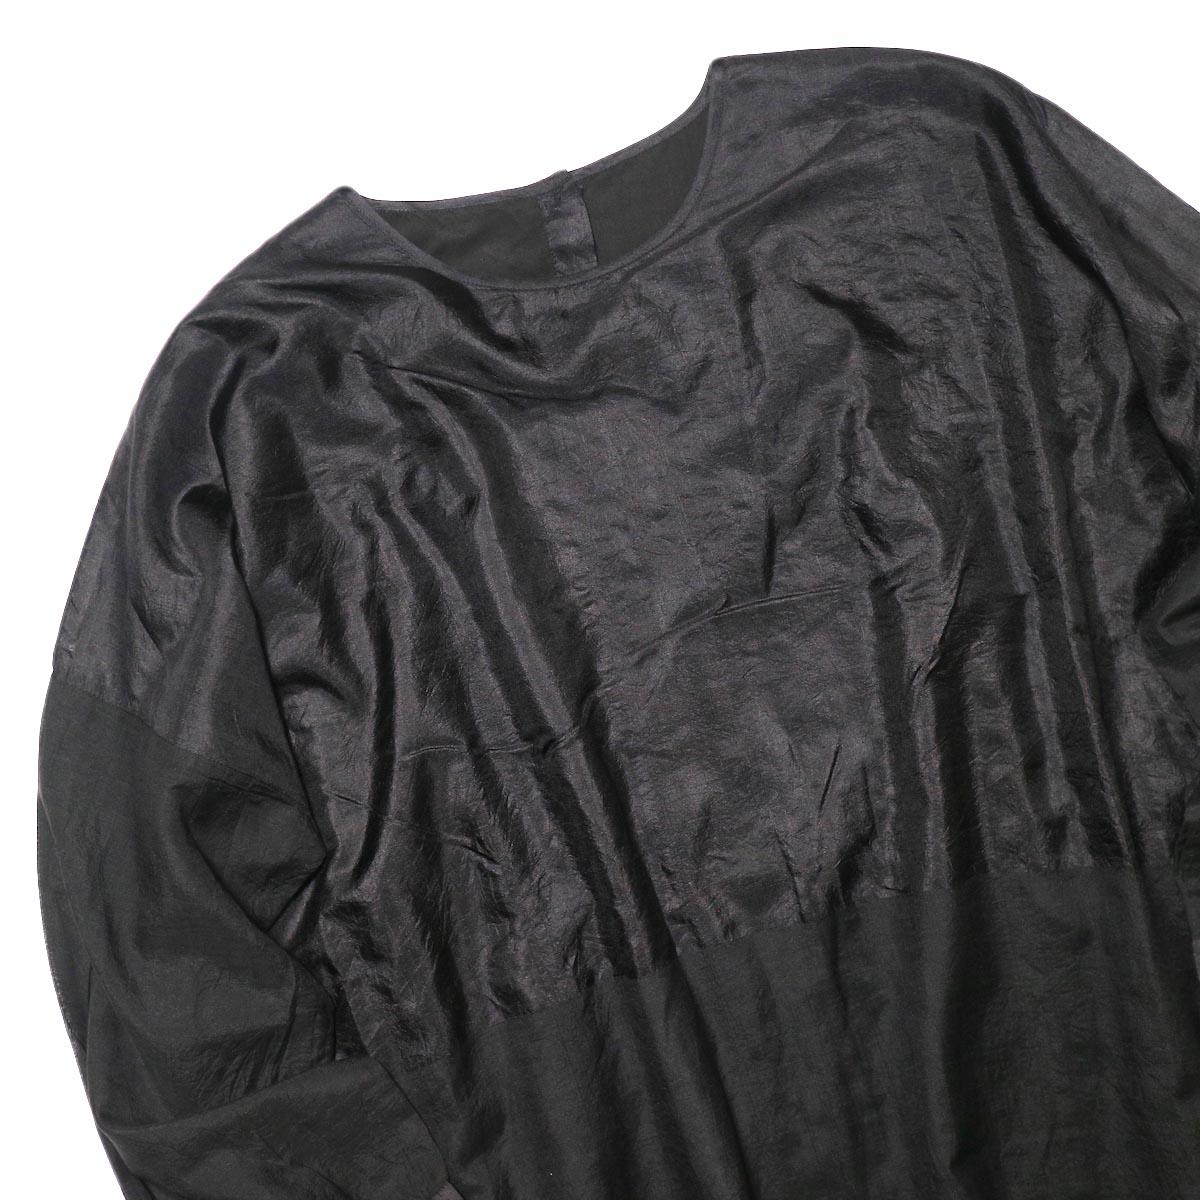 maison de soil / HAND WOVEN COTTON SILK × SILK PLAIN DROP SHOULDER DRESS (black) フロント